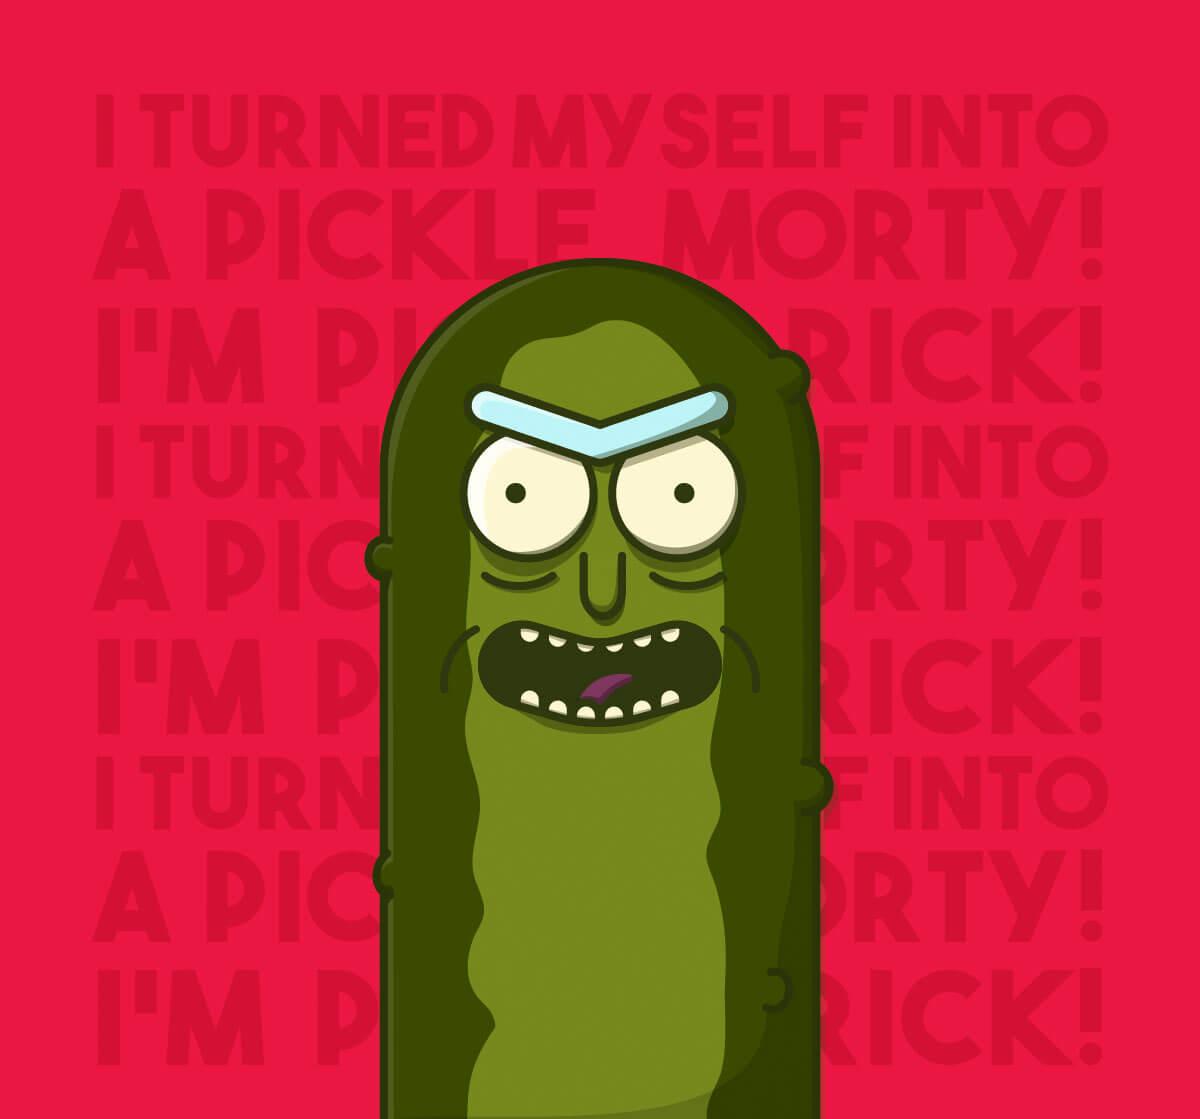 Pickle Rick by Eleazar Morales